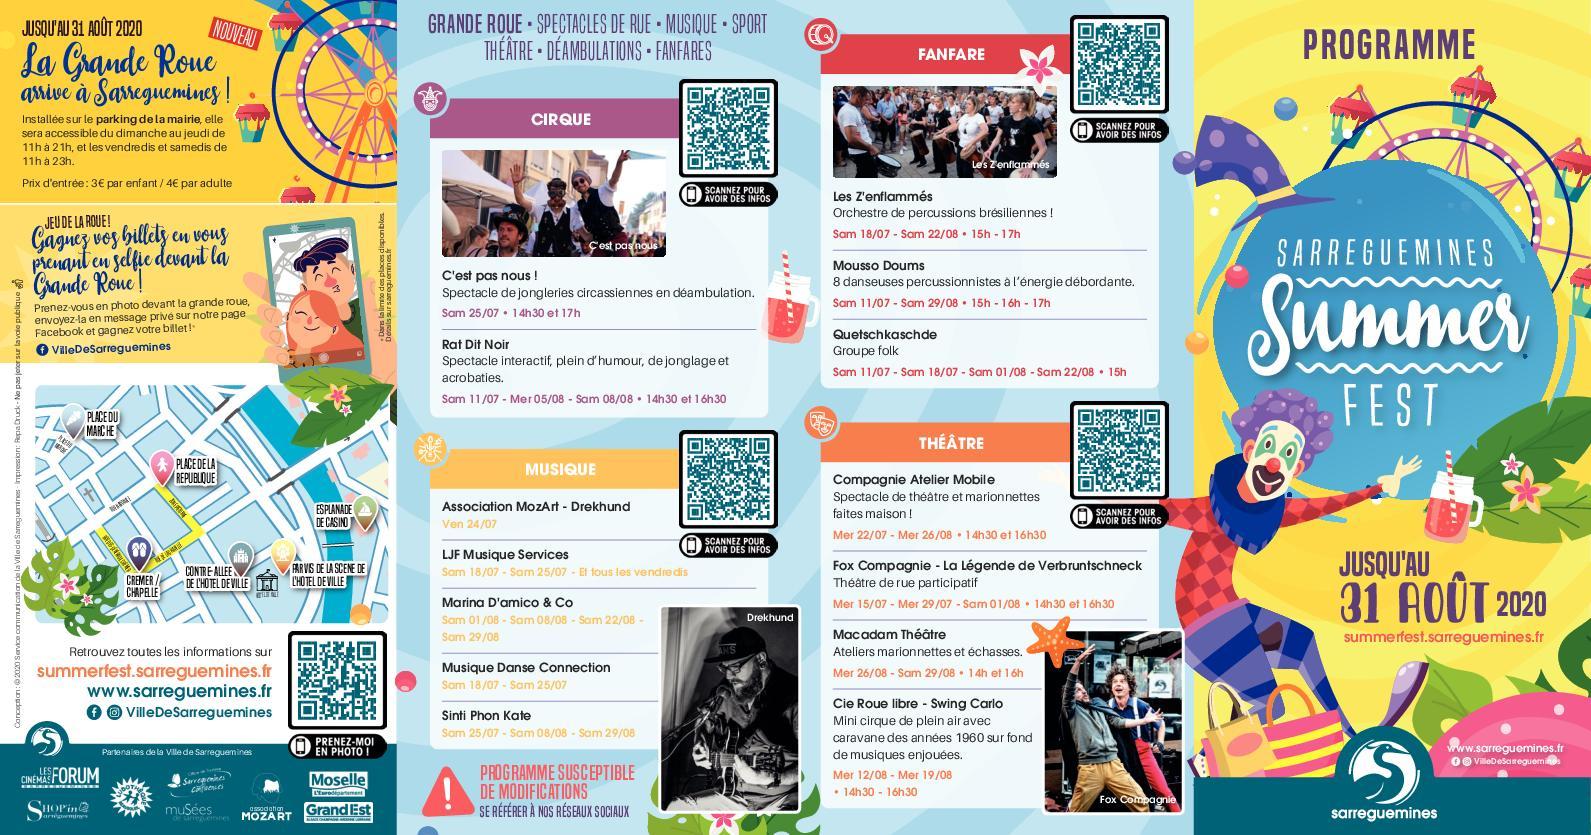 Sarreguemines Summer Fest 2020 - Programme